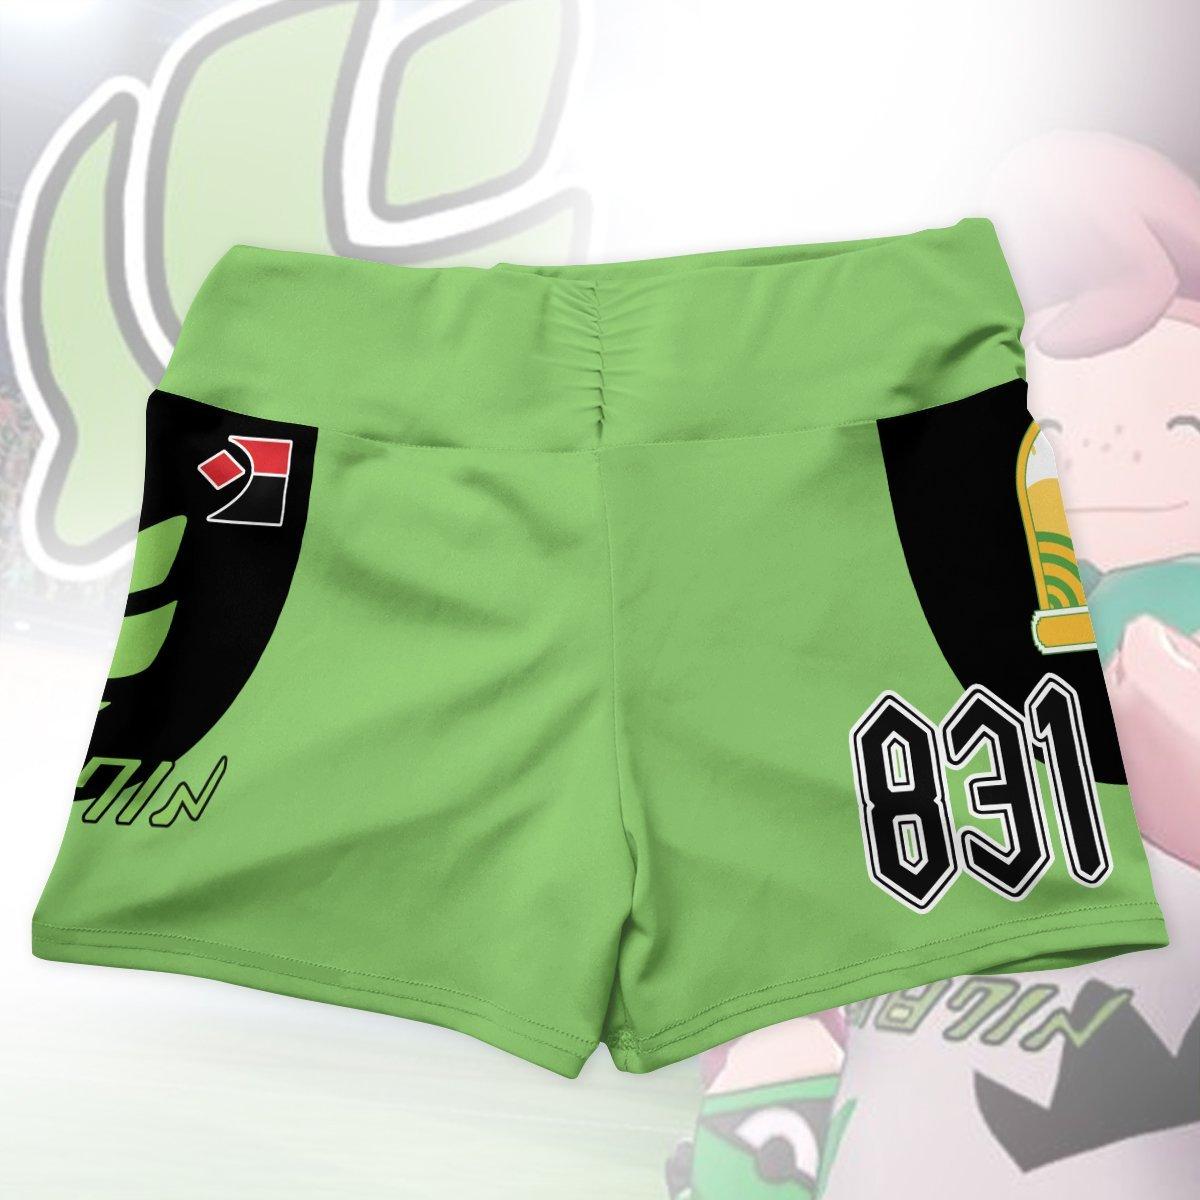 pokemon grass uniform active wear set 753991 - Anime Swimsuits